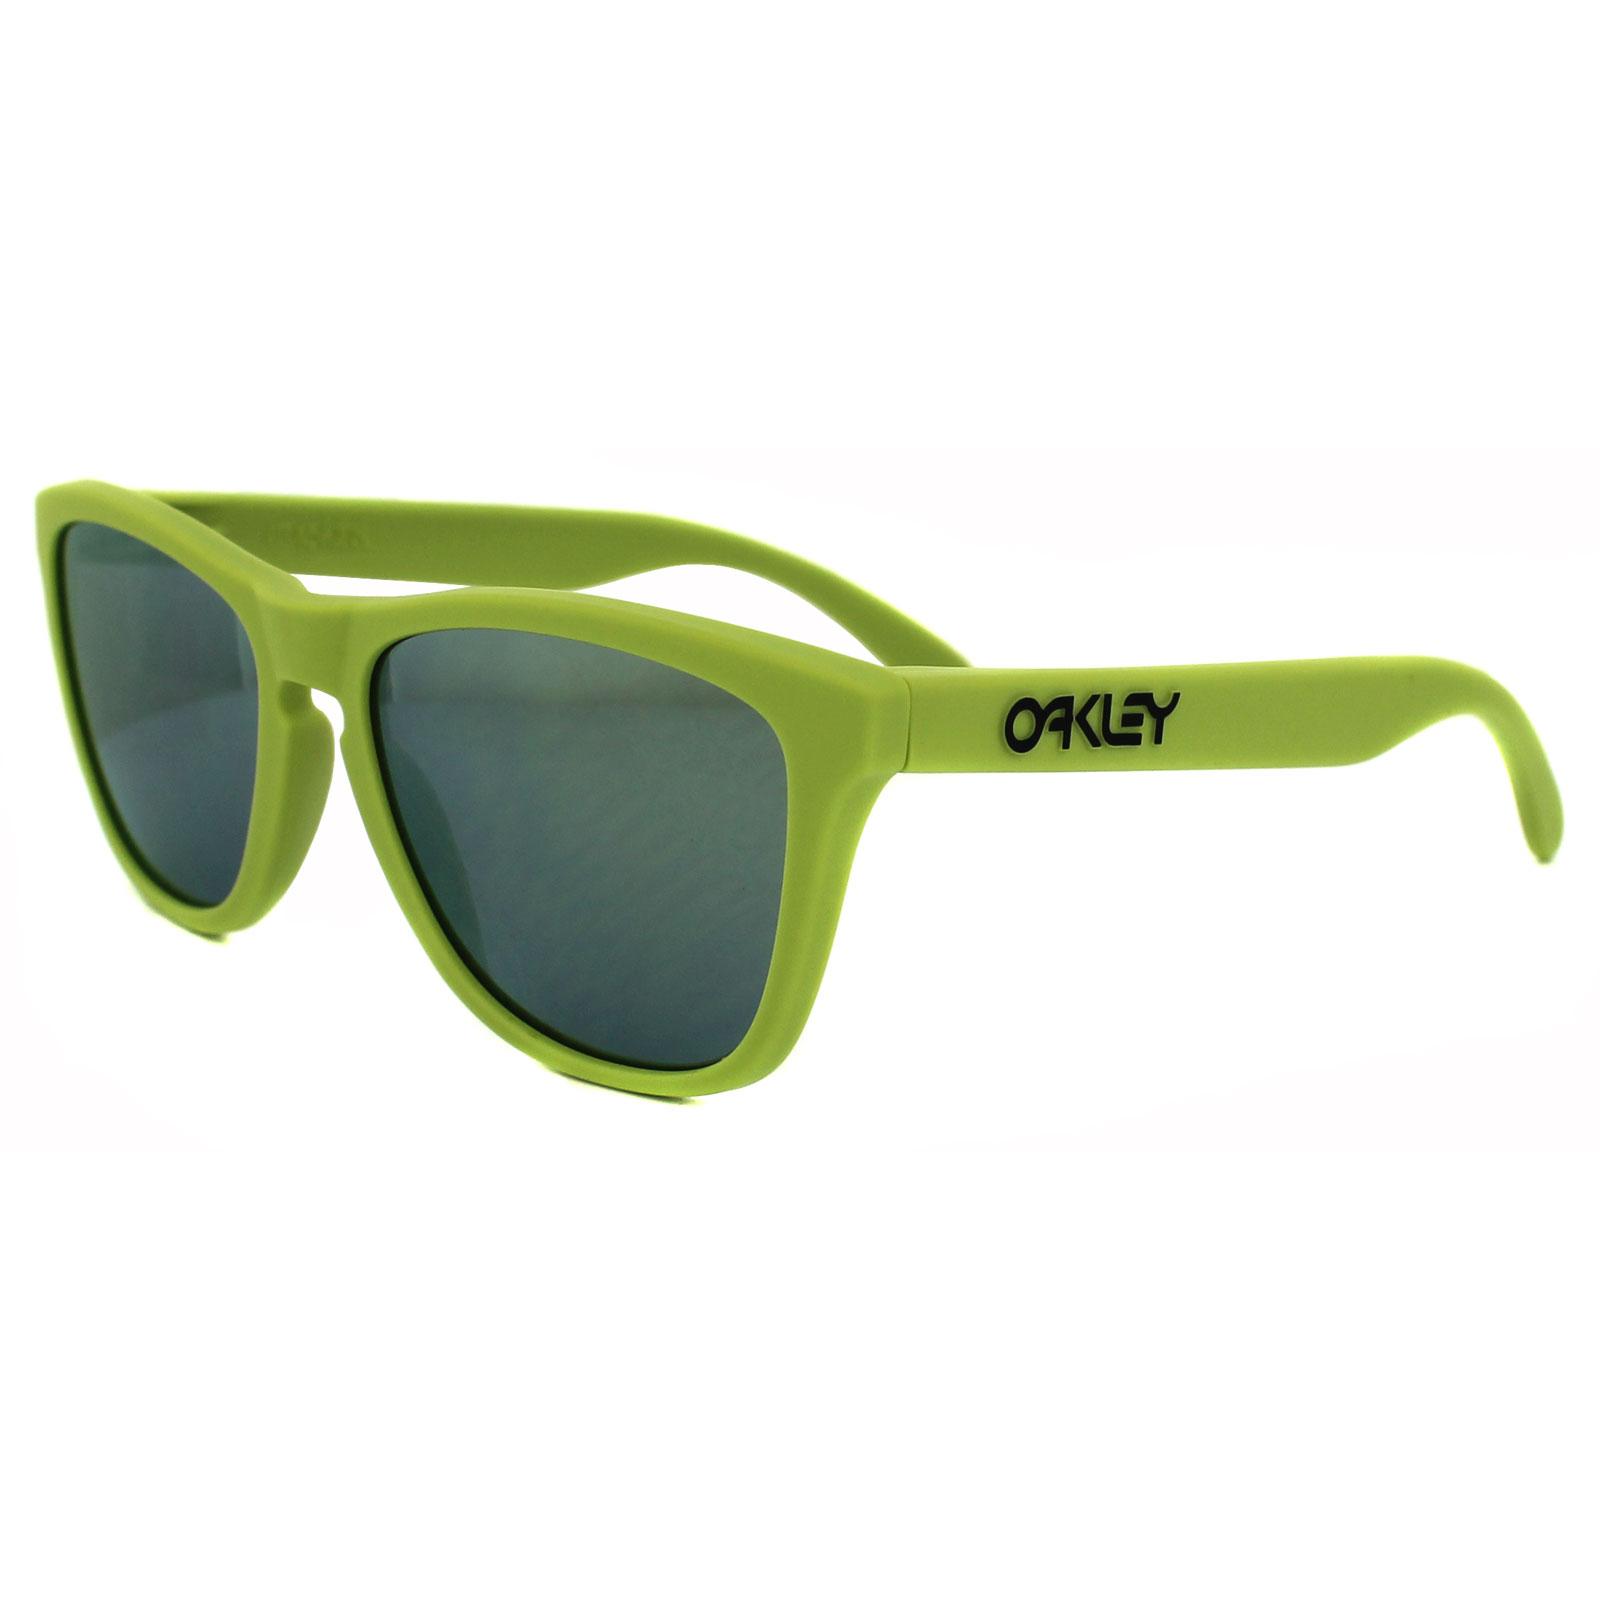 19ccd75f5d Green Oakley Sunglasses On Ebay « Heritage Malta